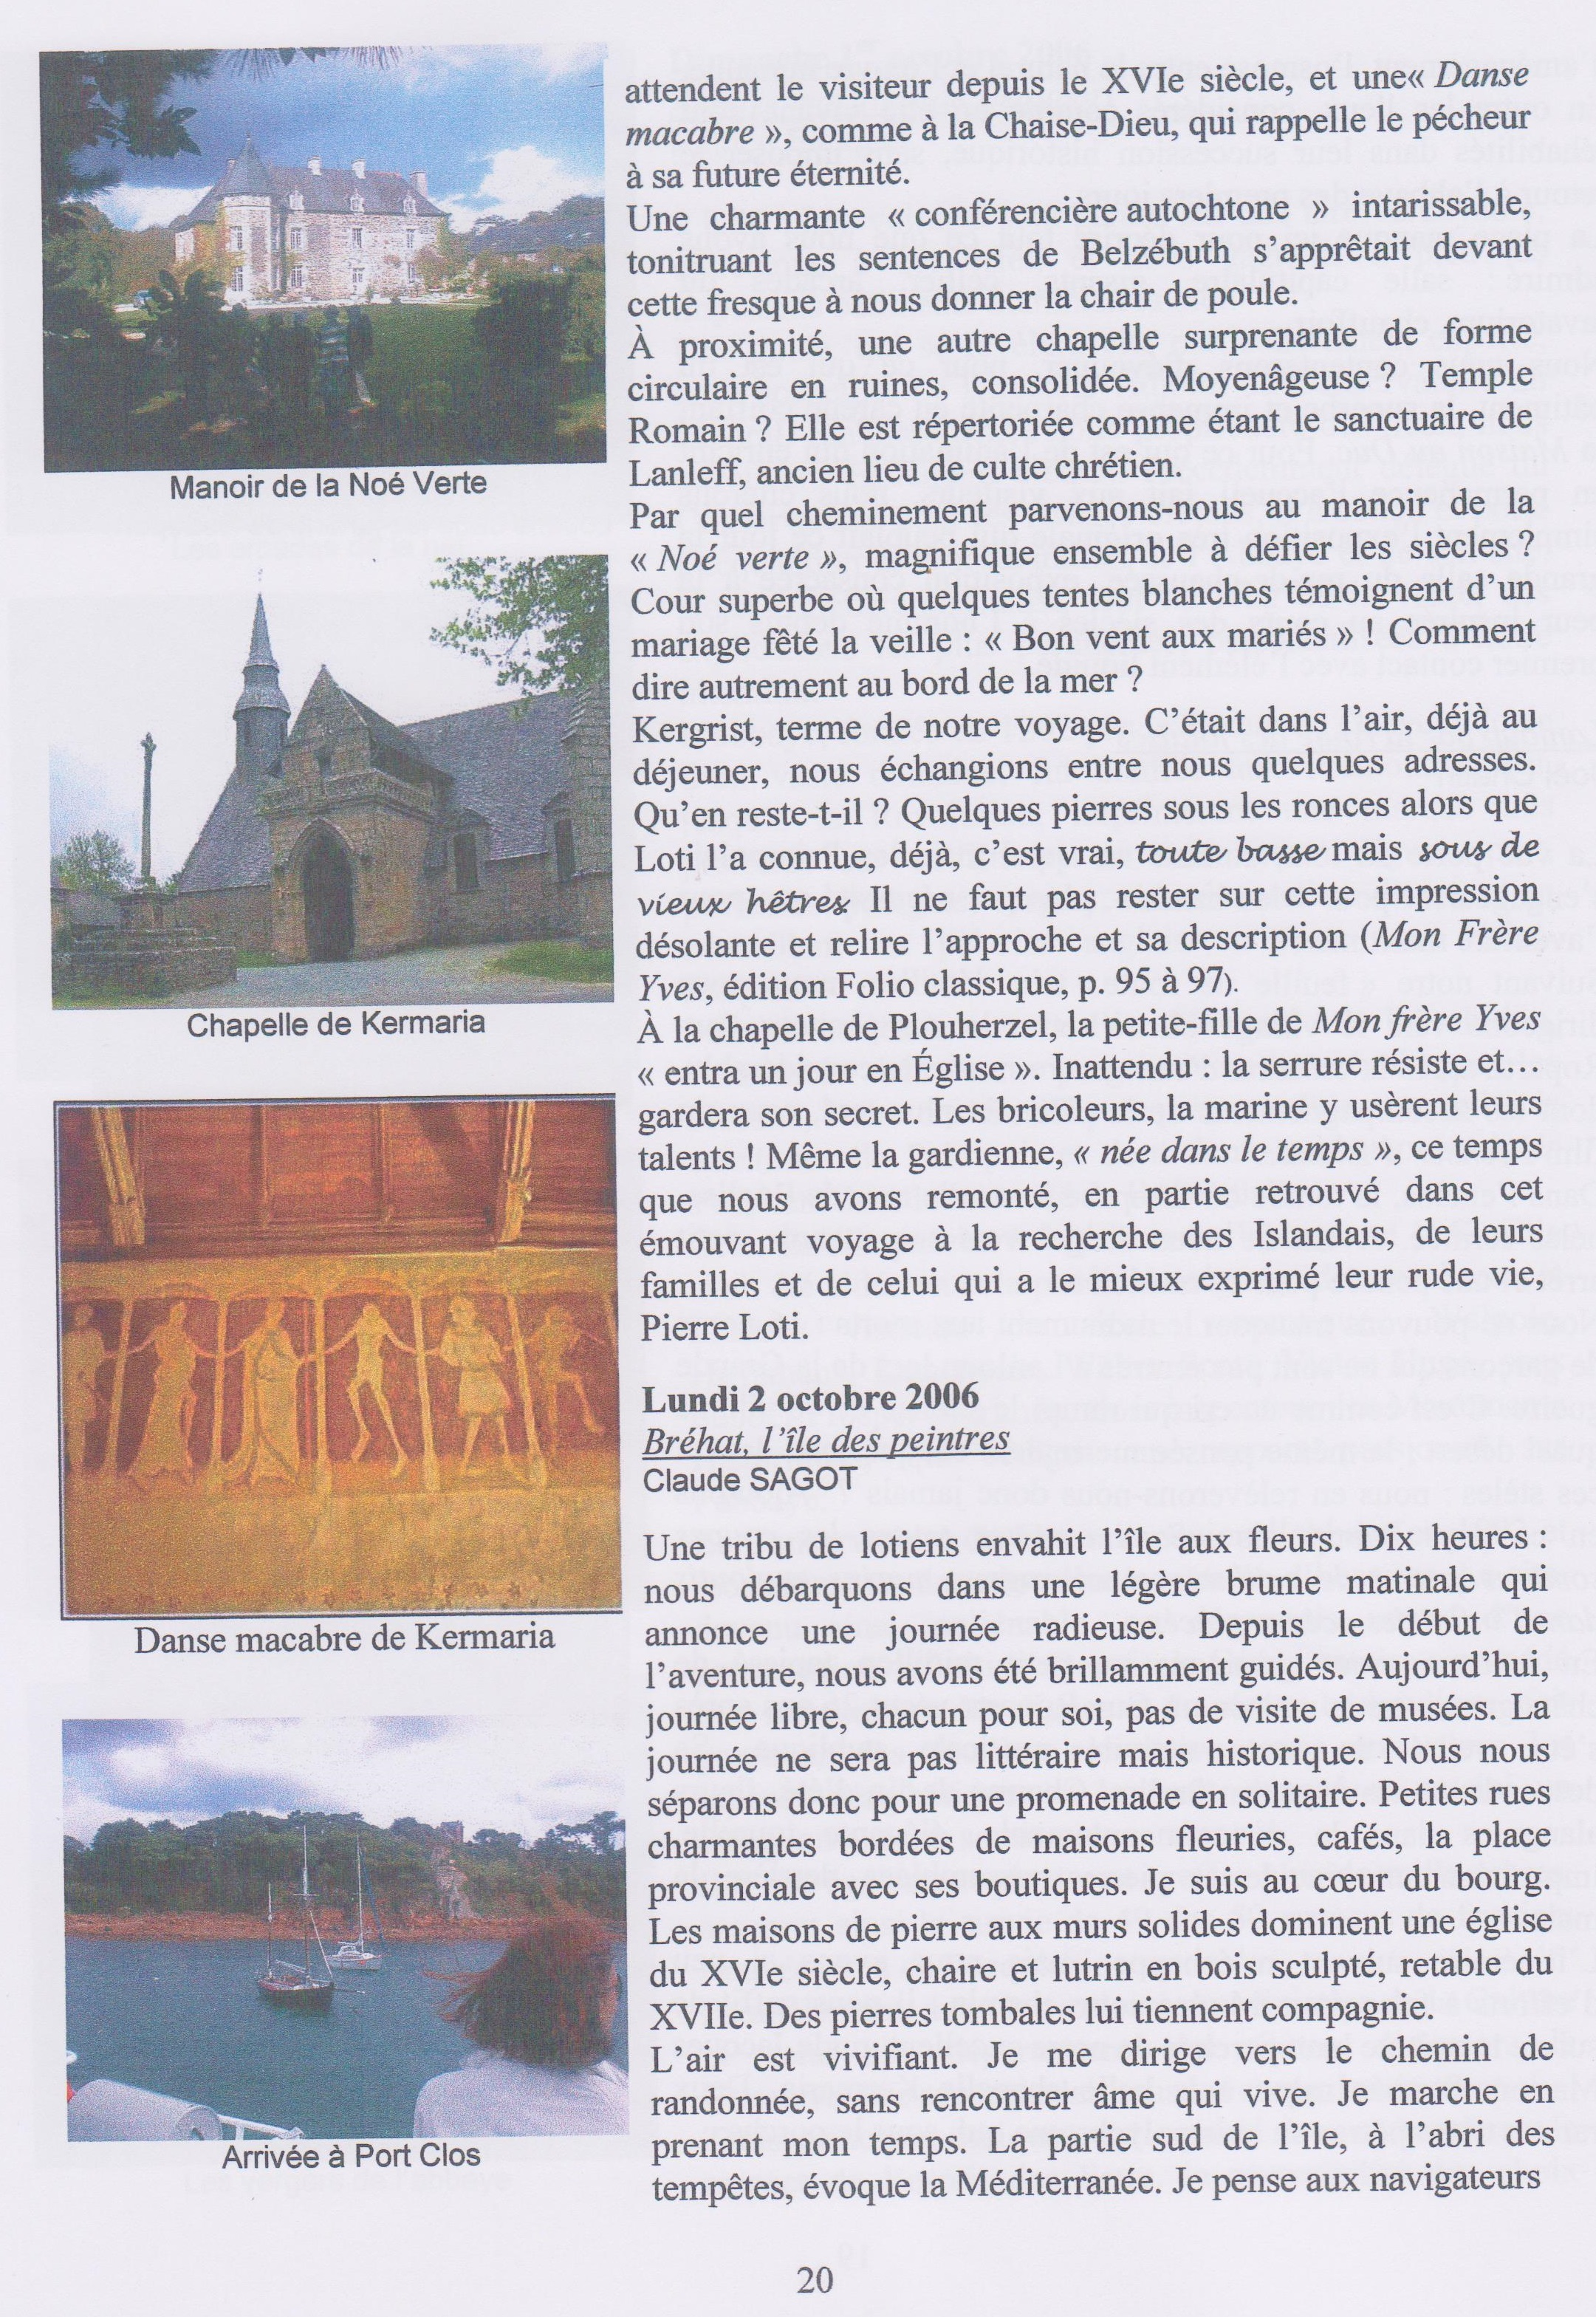 Voyage Paimpol 2006-page 20